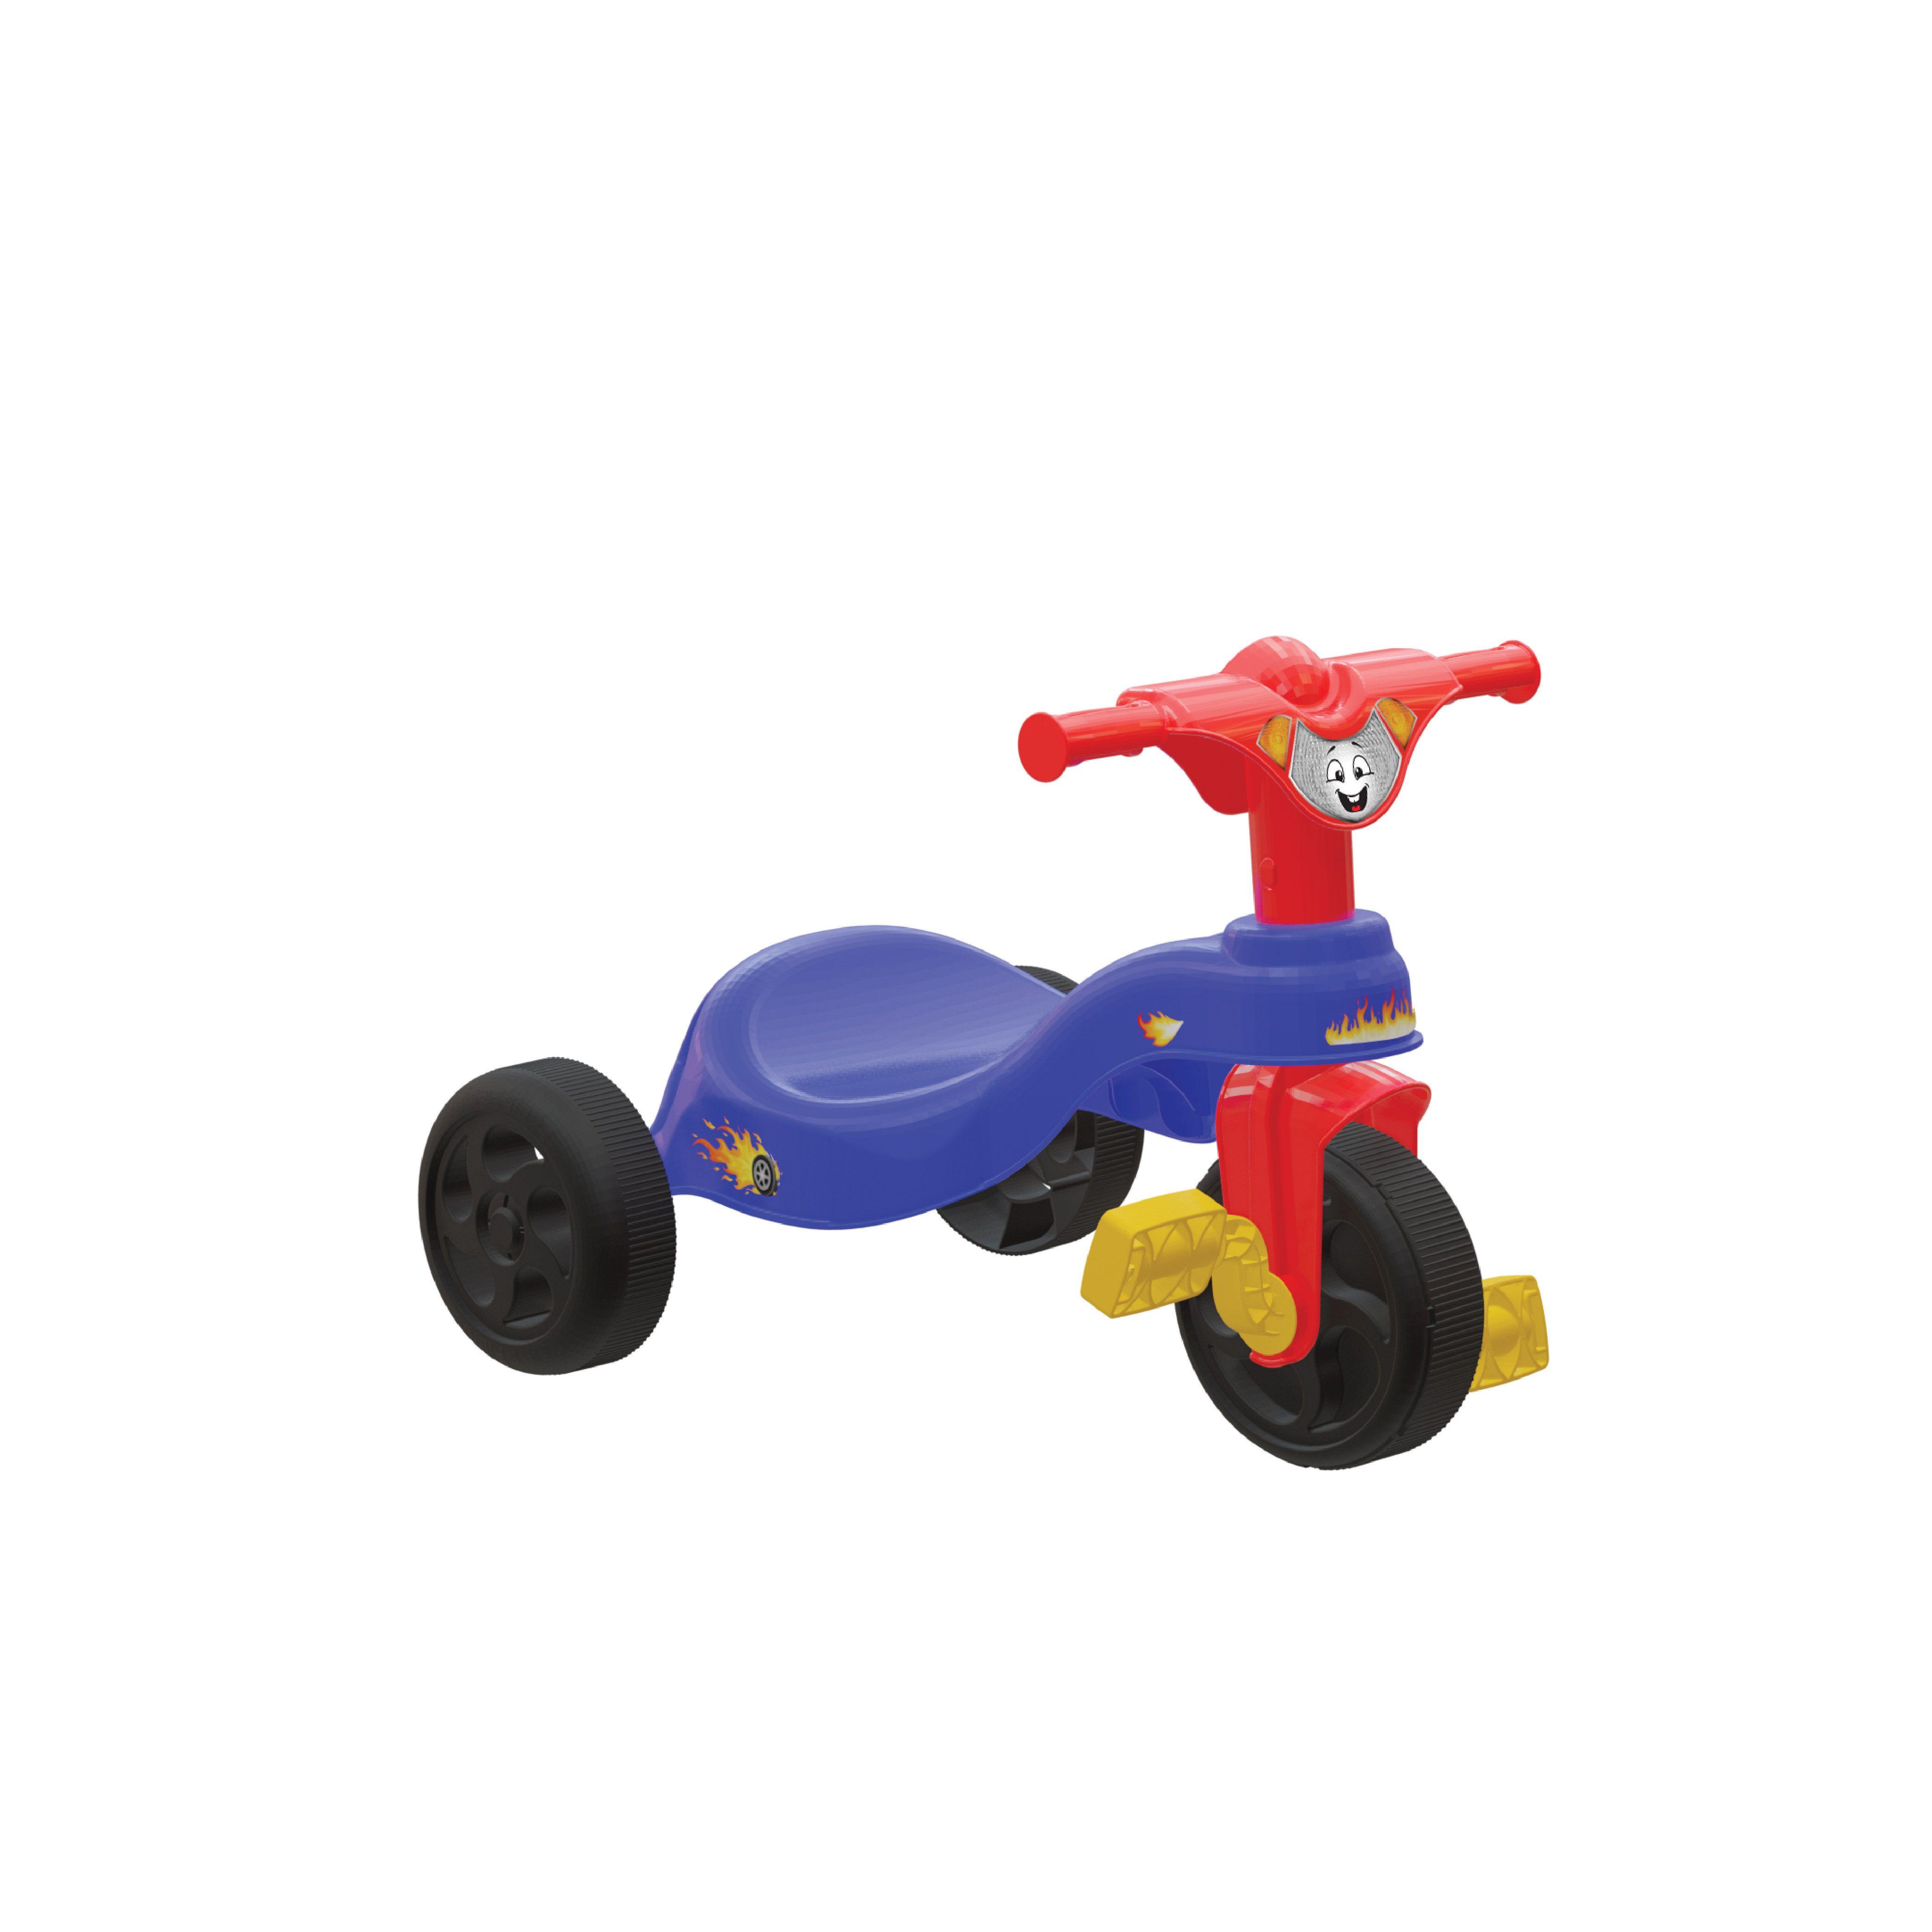 Triciclo Fast-790351